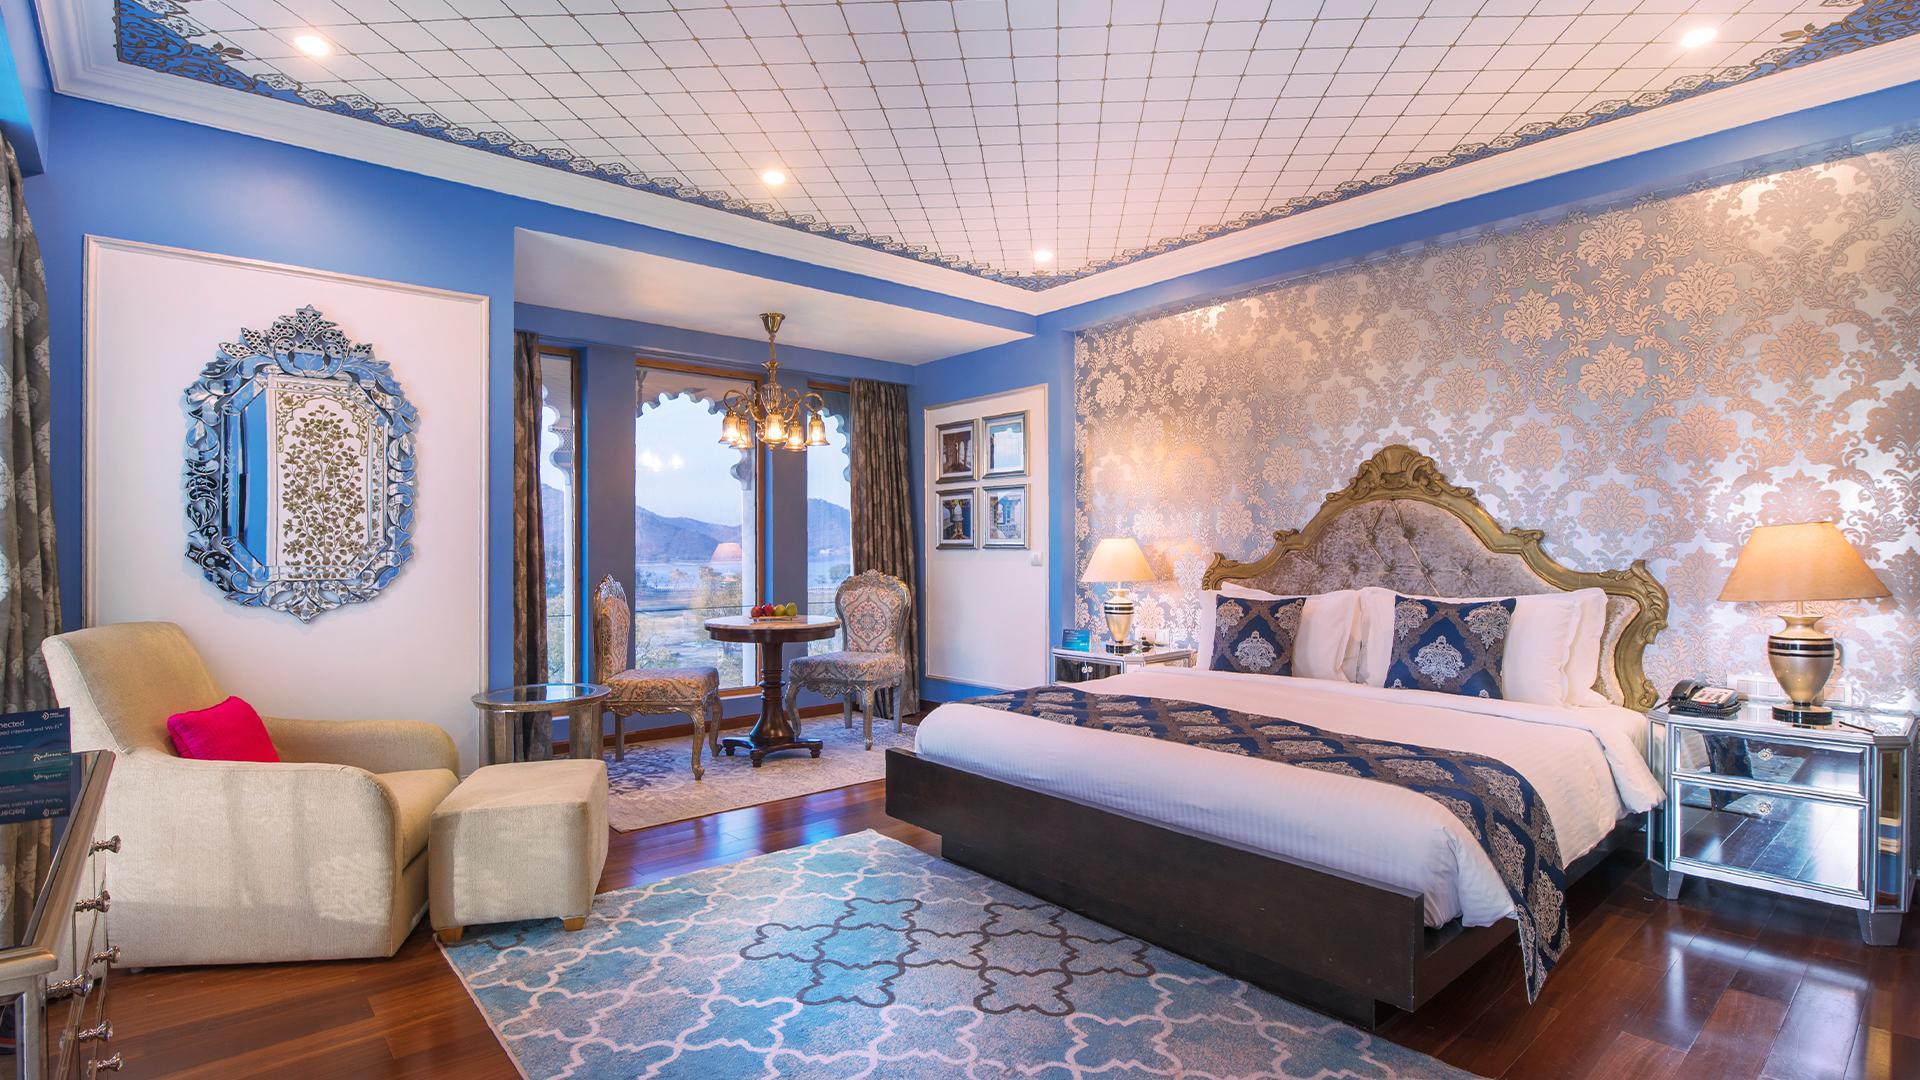 Premium Suite image 1 at Radisson Blu Udaipur Palace Resort and Spa by Udaipur, Rajasthan, India